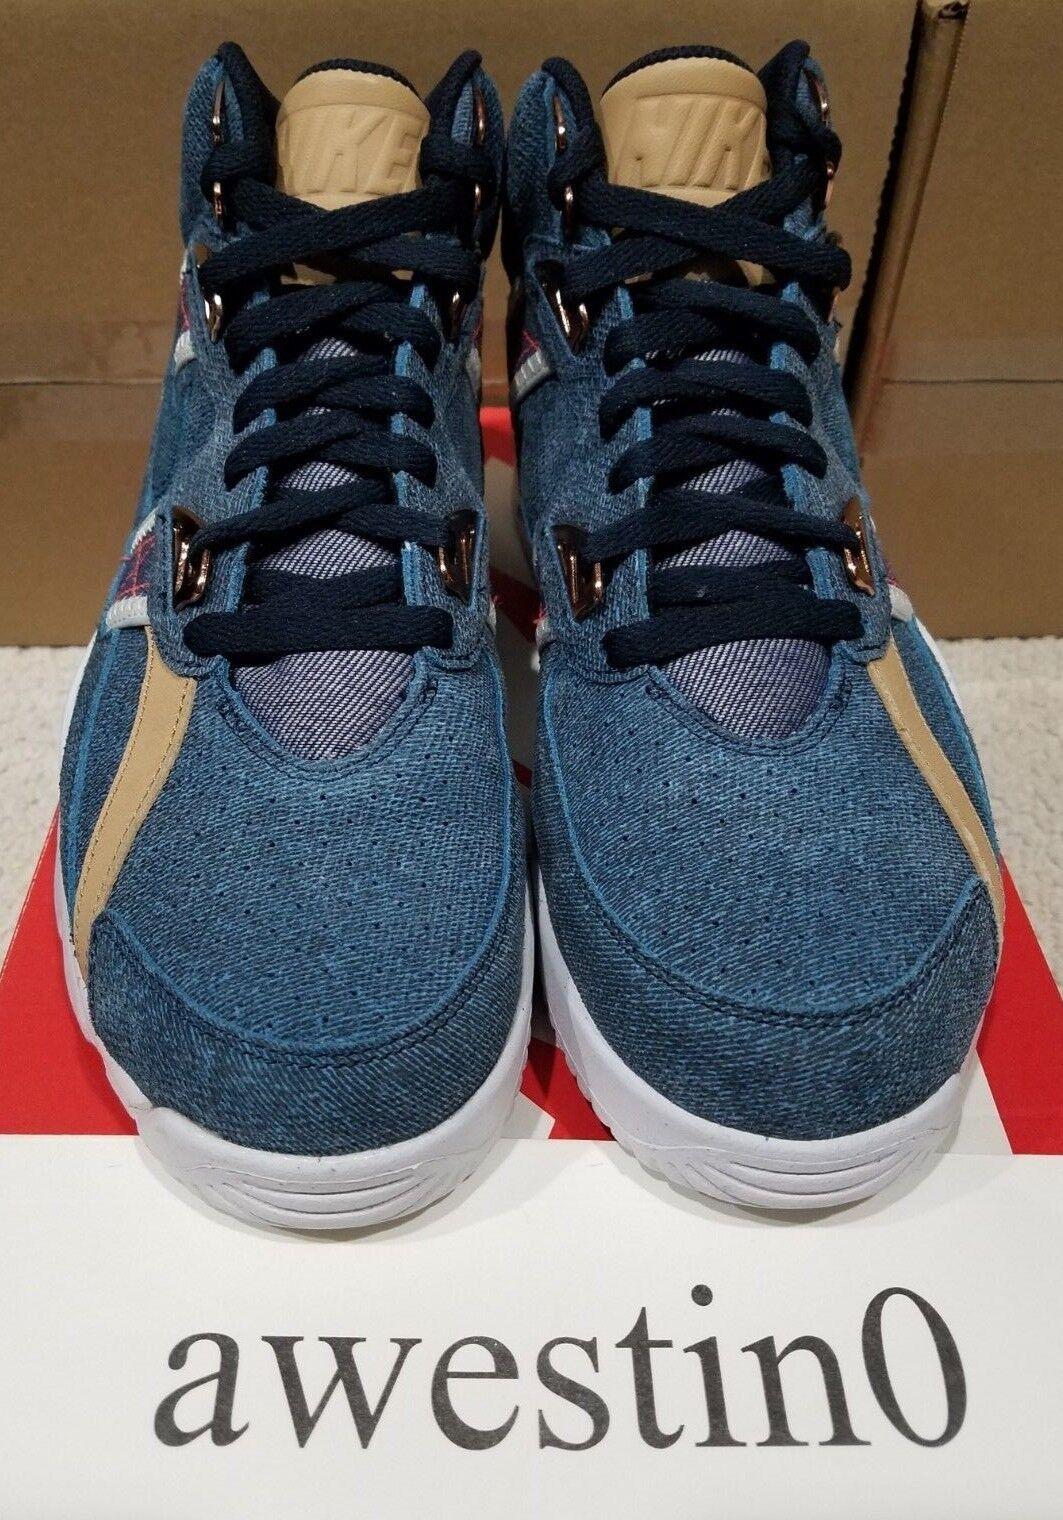 aa0eebe67616 Nike Air Trainer SC High PRM Denim Men s Size 10 Hi Shoes SNEAKERS ...